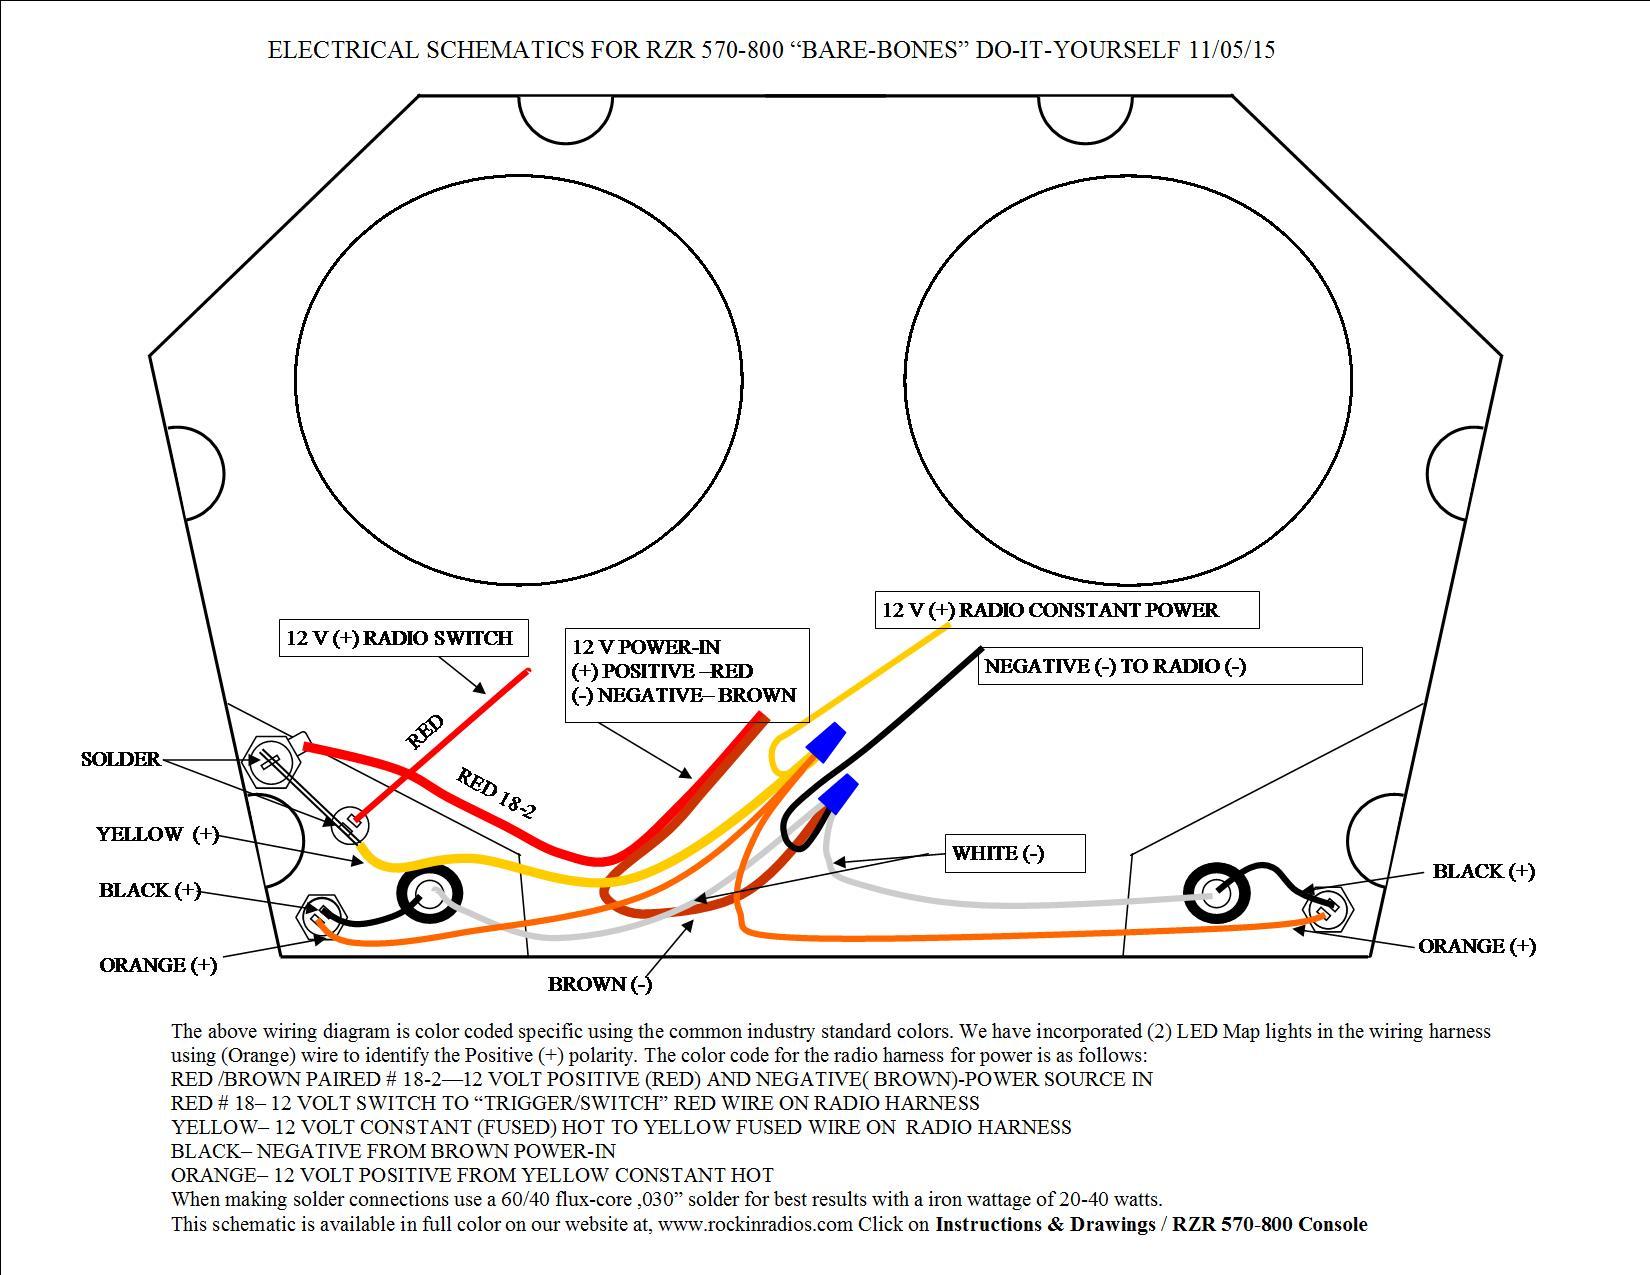 Wiring Diagram Arctic Cat Spirit 32 Images F8 Free Download Schematic 650 Wire Diagrams Rzr 570 800 Schematics 2 11 15resize